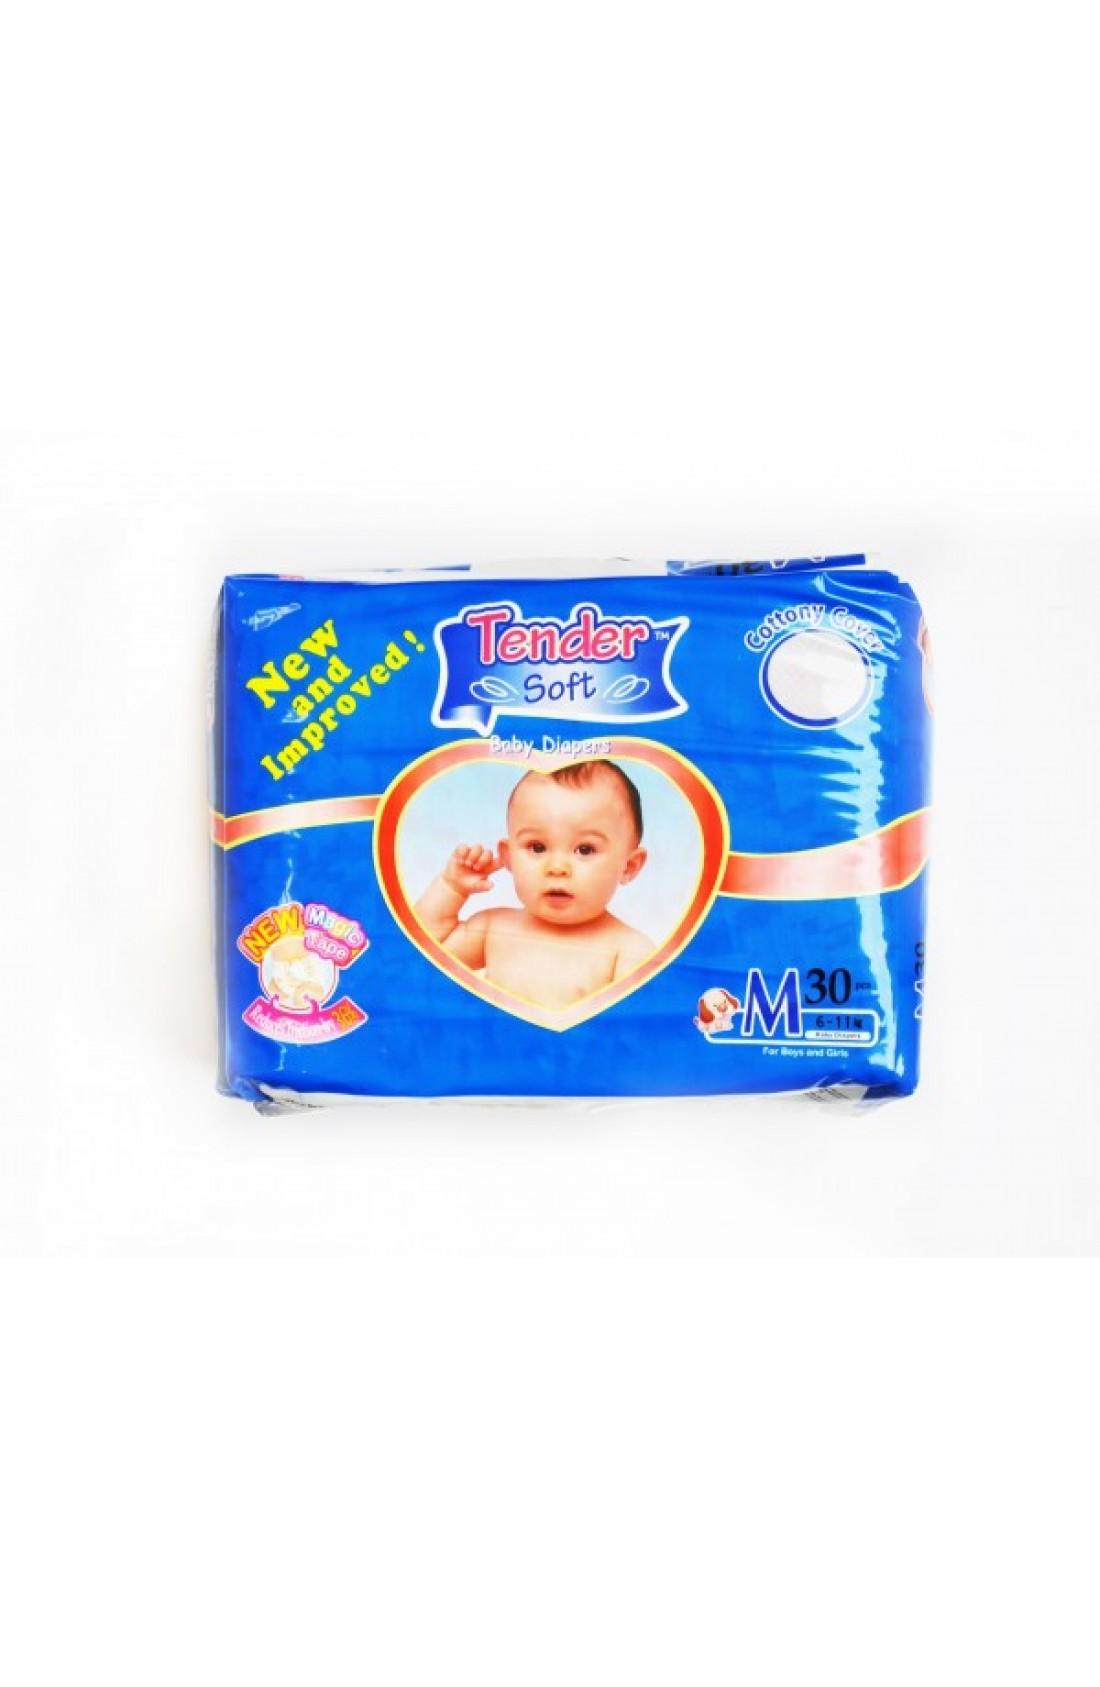 MINE BABY Medium Nappies 30pk